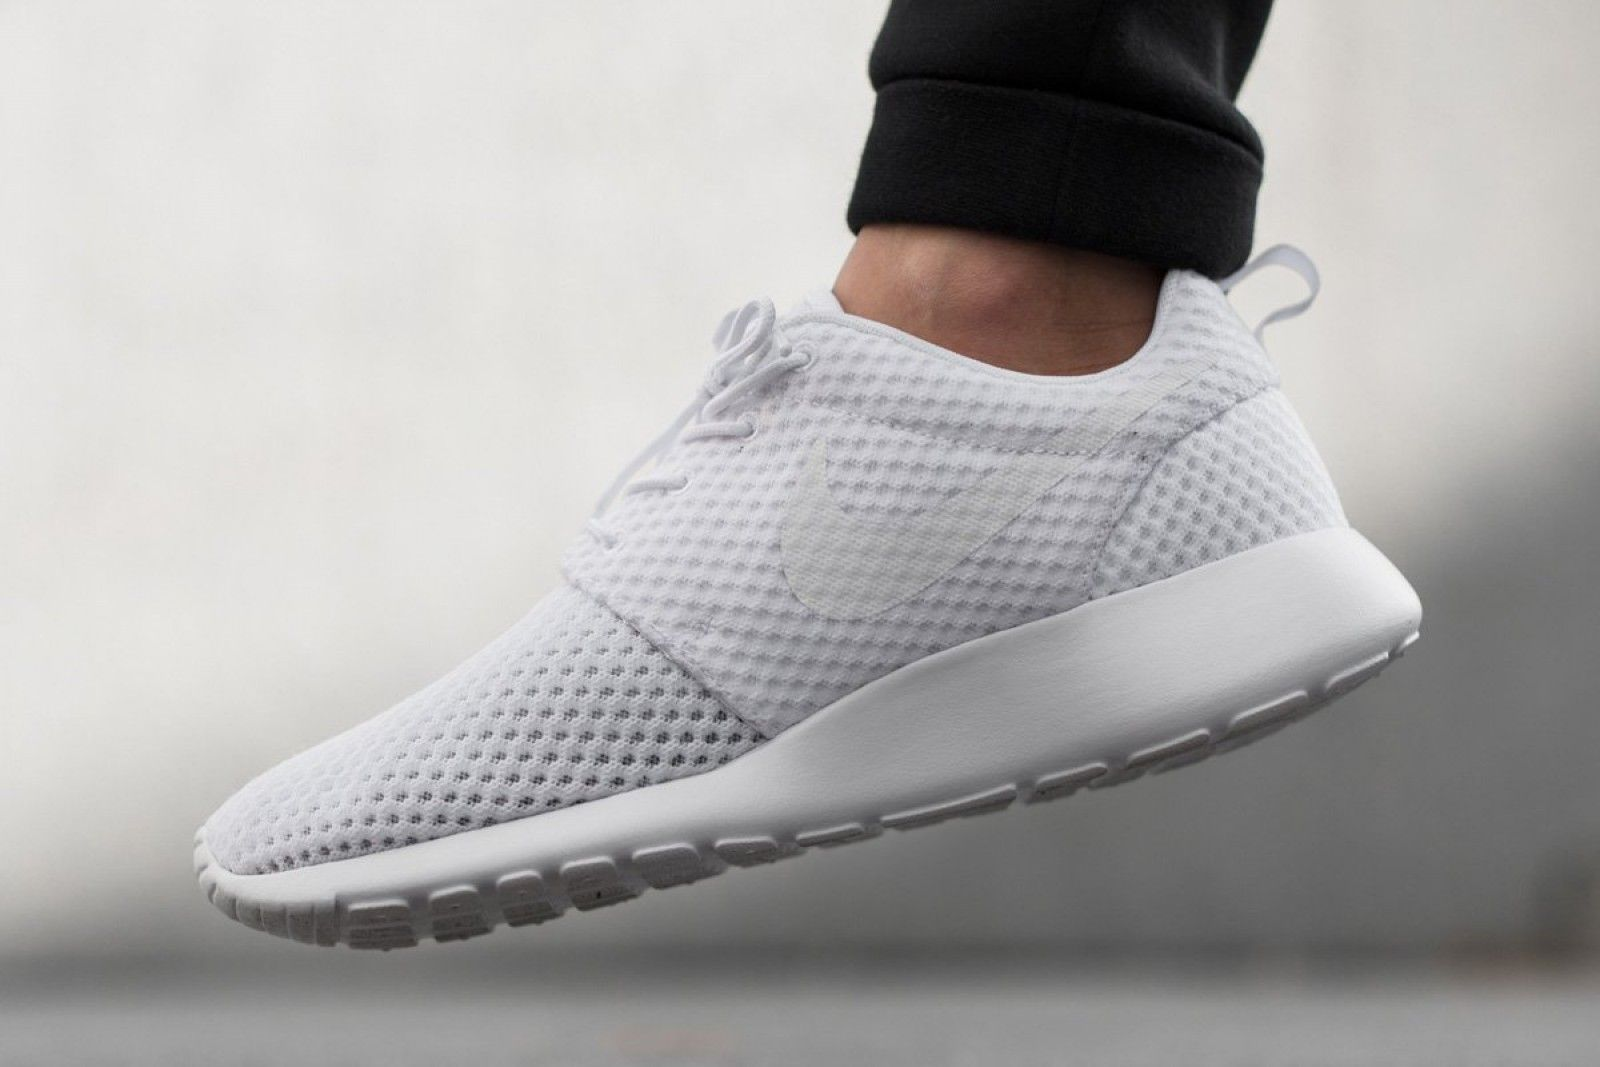 Nike Roshe One BR White Wolfgrey 718552 110 | Shoes